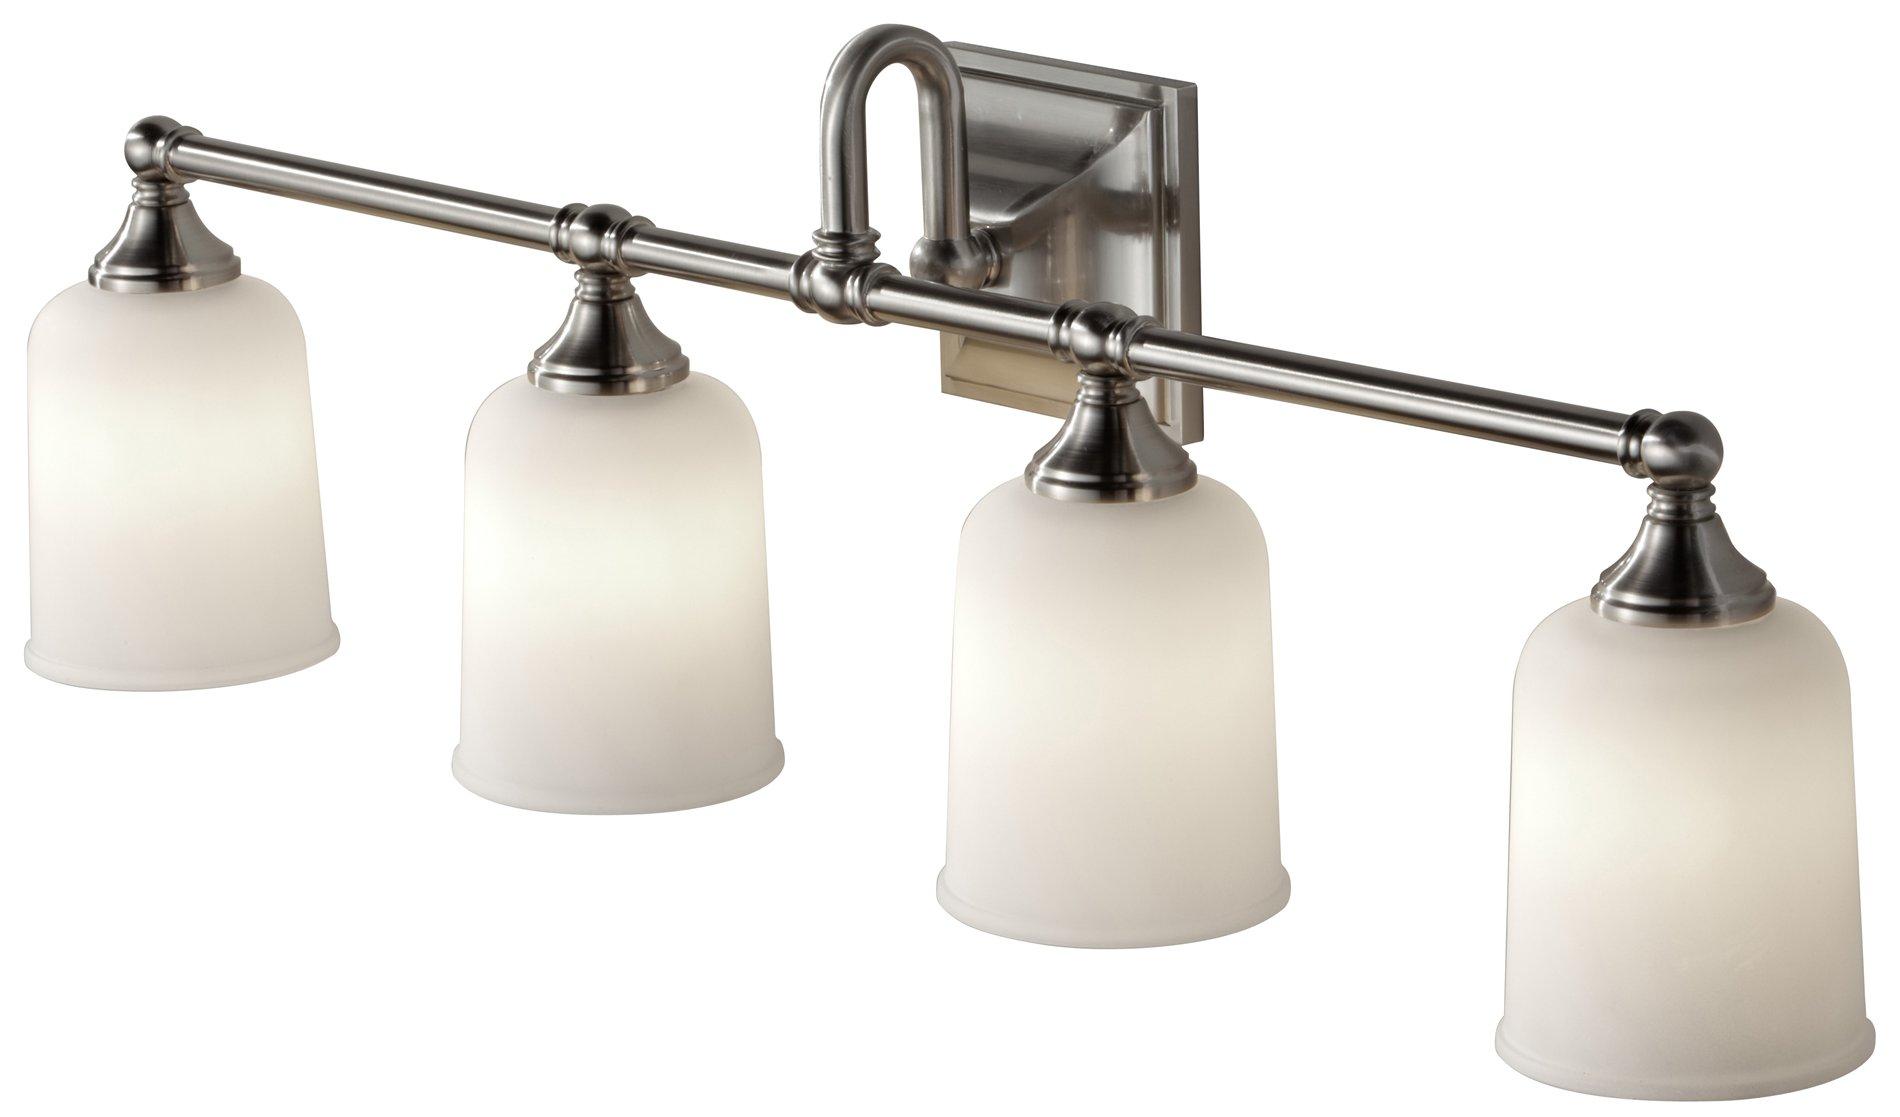 Murray feiss vs27004 bs harvard transitional bathroom for Murray feiss bathroom lighting fixtures